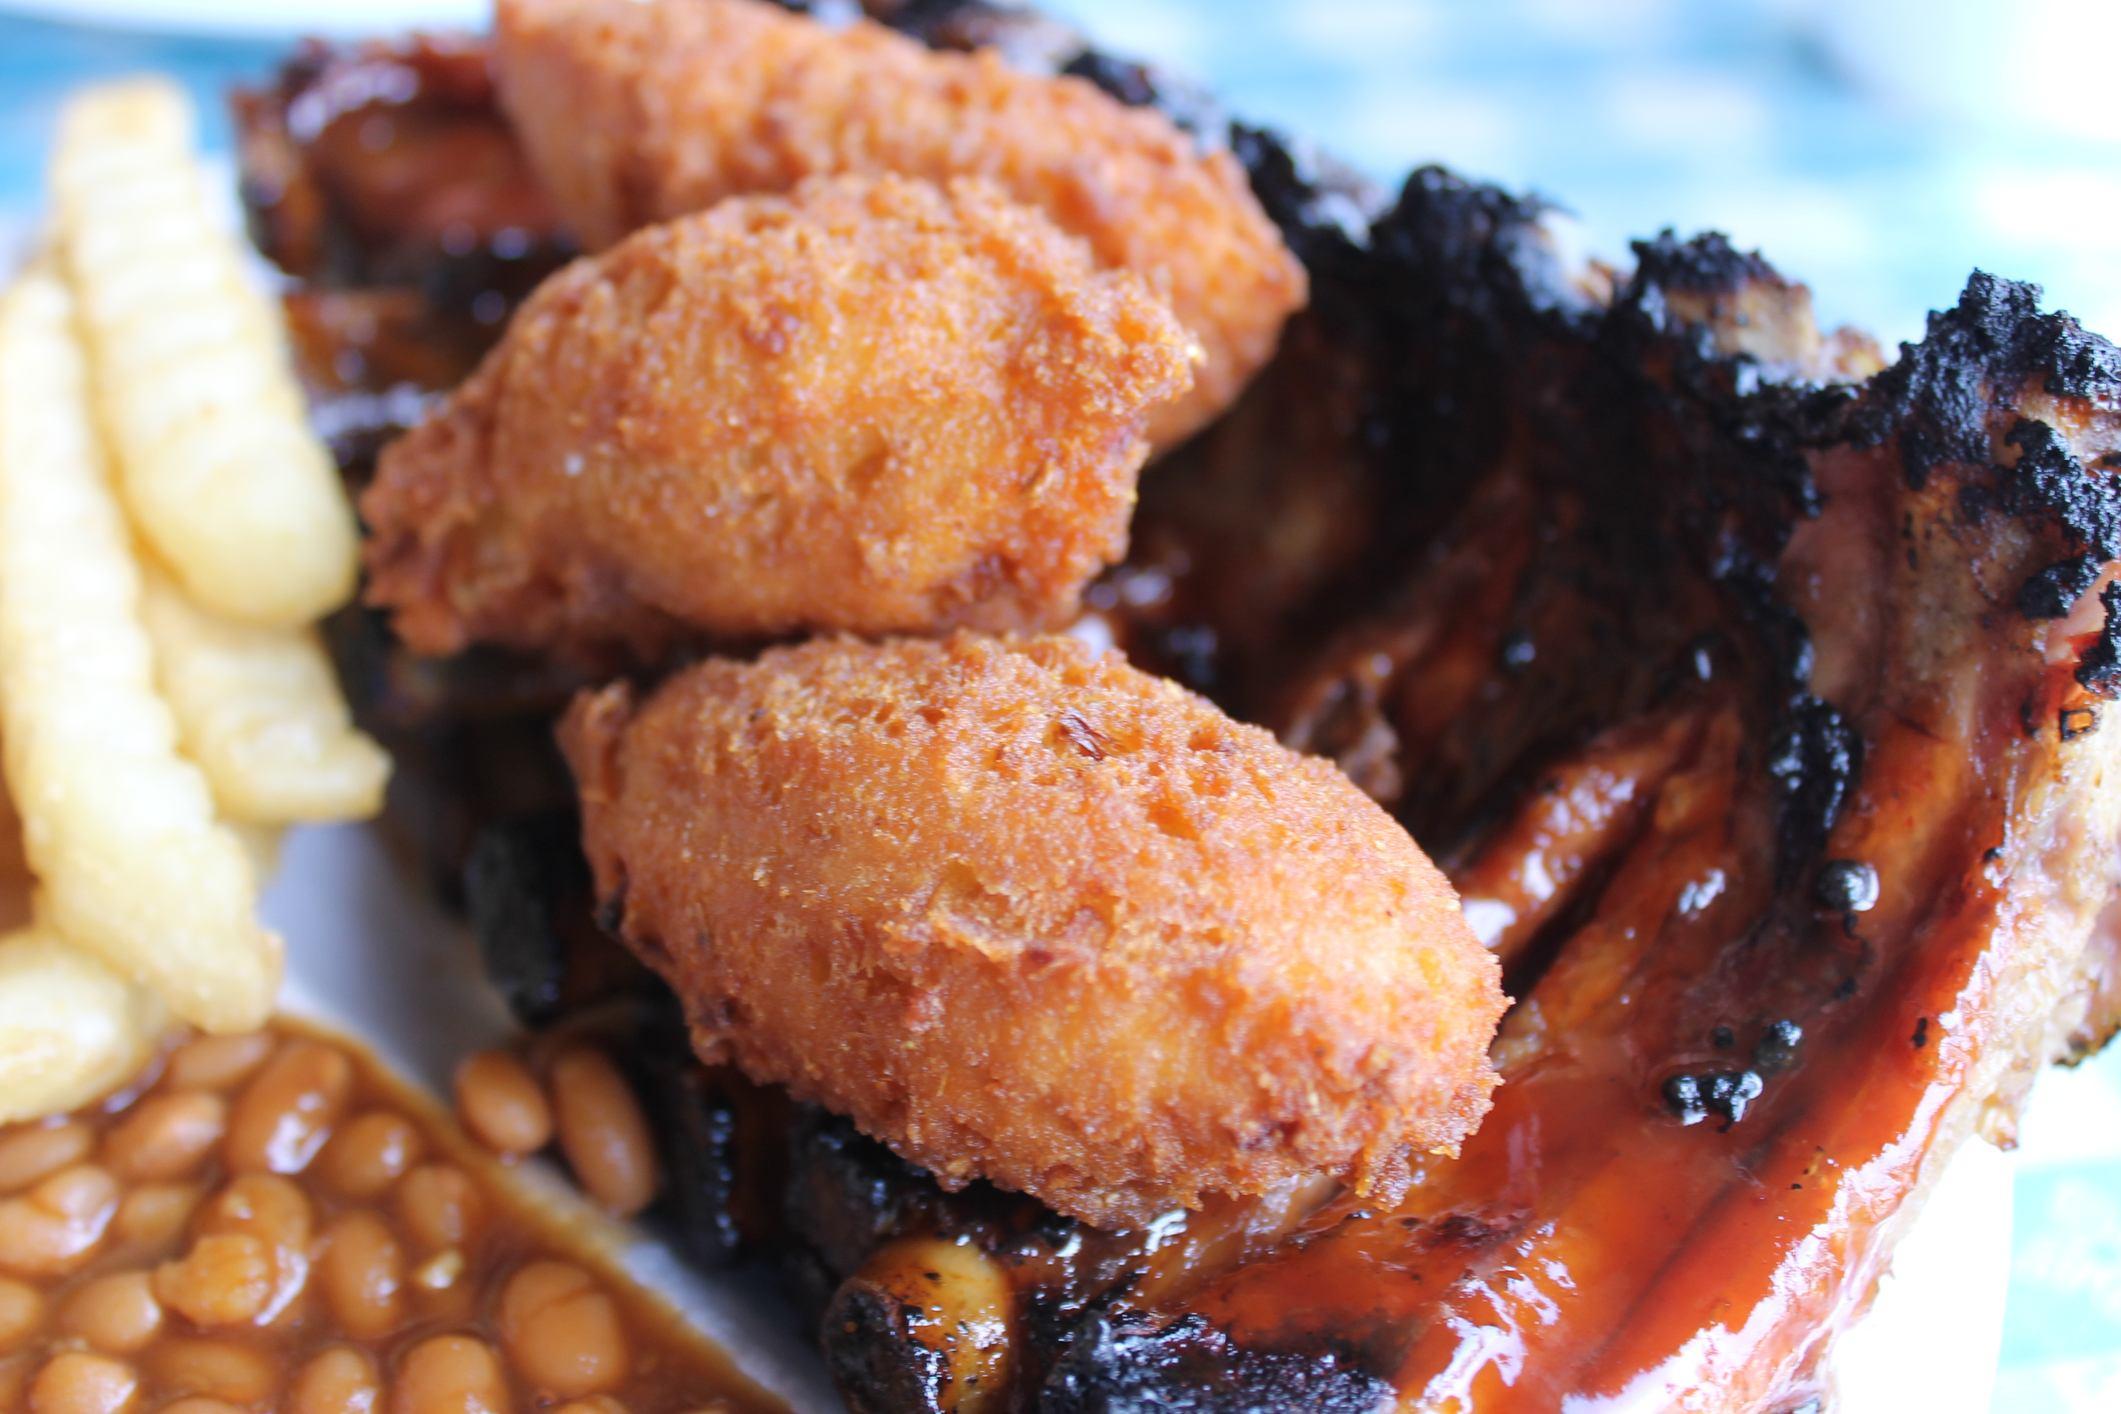 Carolina barbecue ribs